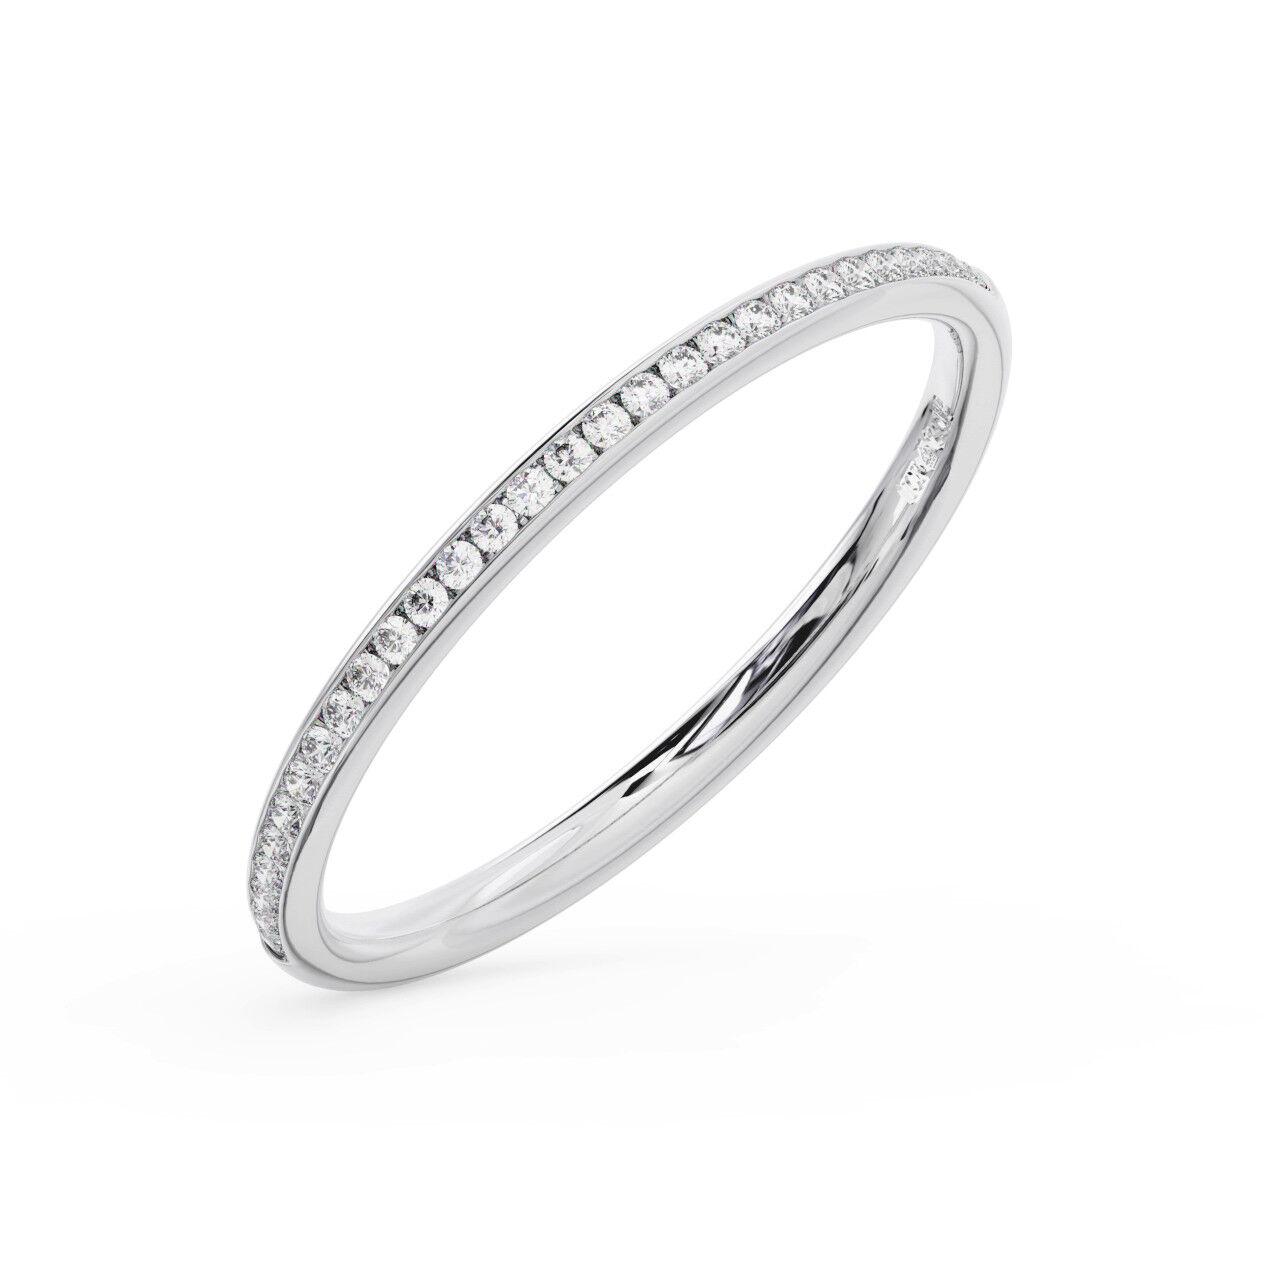 2mm Channel Set Round Brilliant Diamond Half Eternity Ring in 18K gold